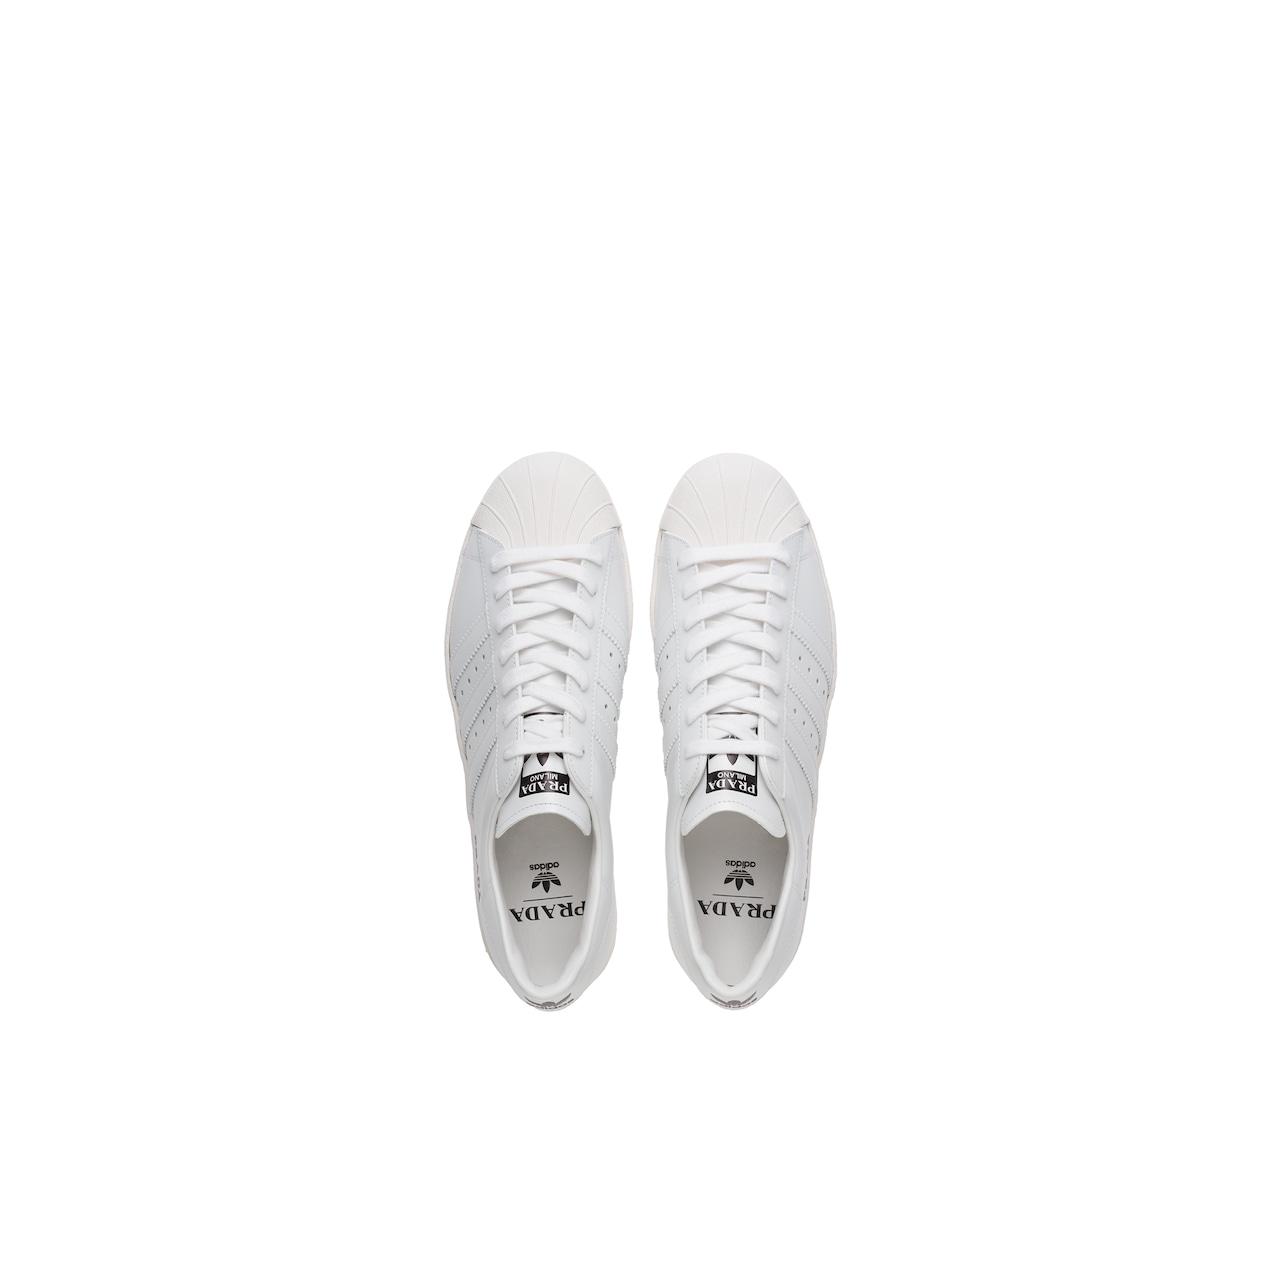 Prada Prada for adidas Limited Edition 4